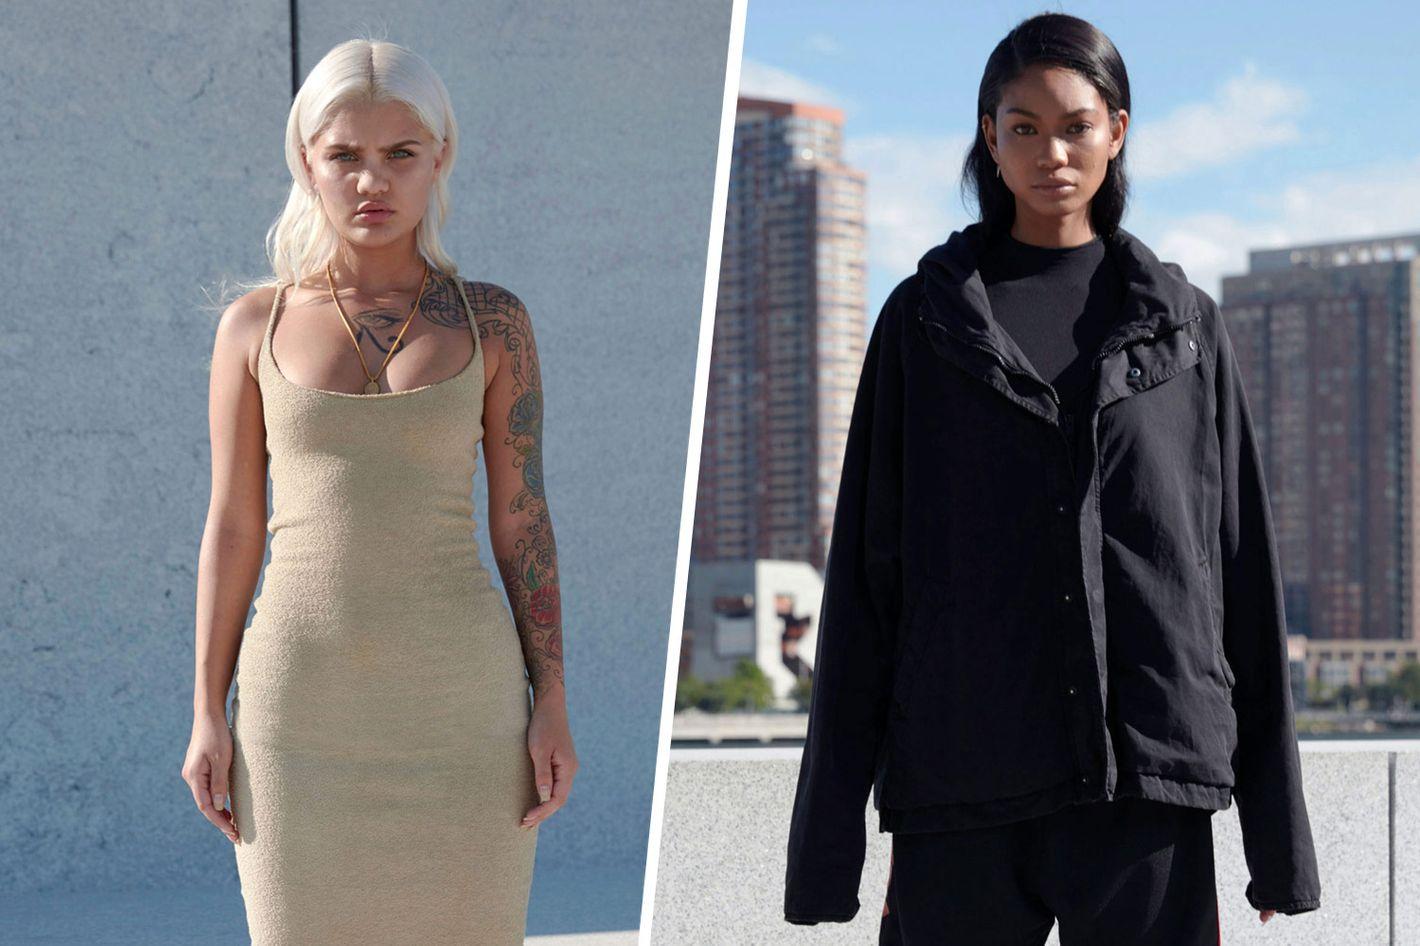 fdf0d1097c1cb5 Models Amina Blue and Chanel Iman Talk Yeezy Season 4